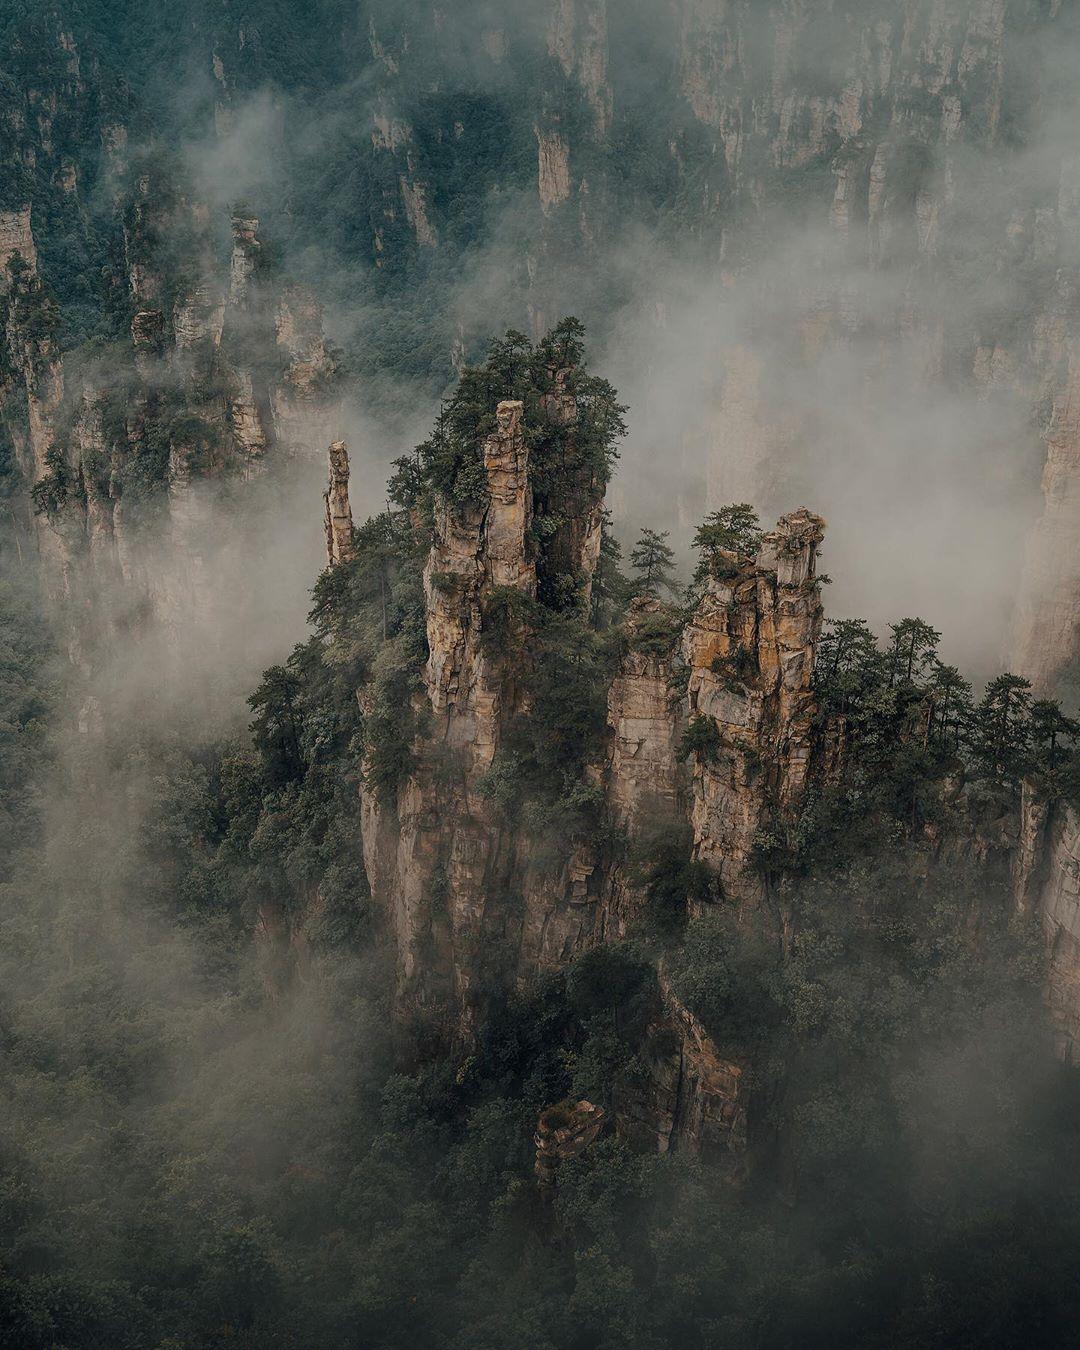 Природа и путешествия на снимках Каса Шеридана